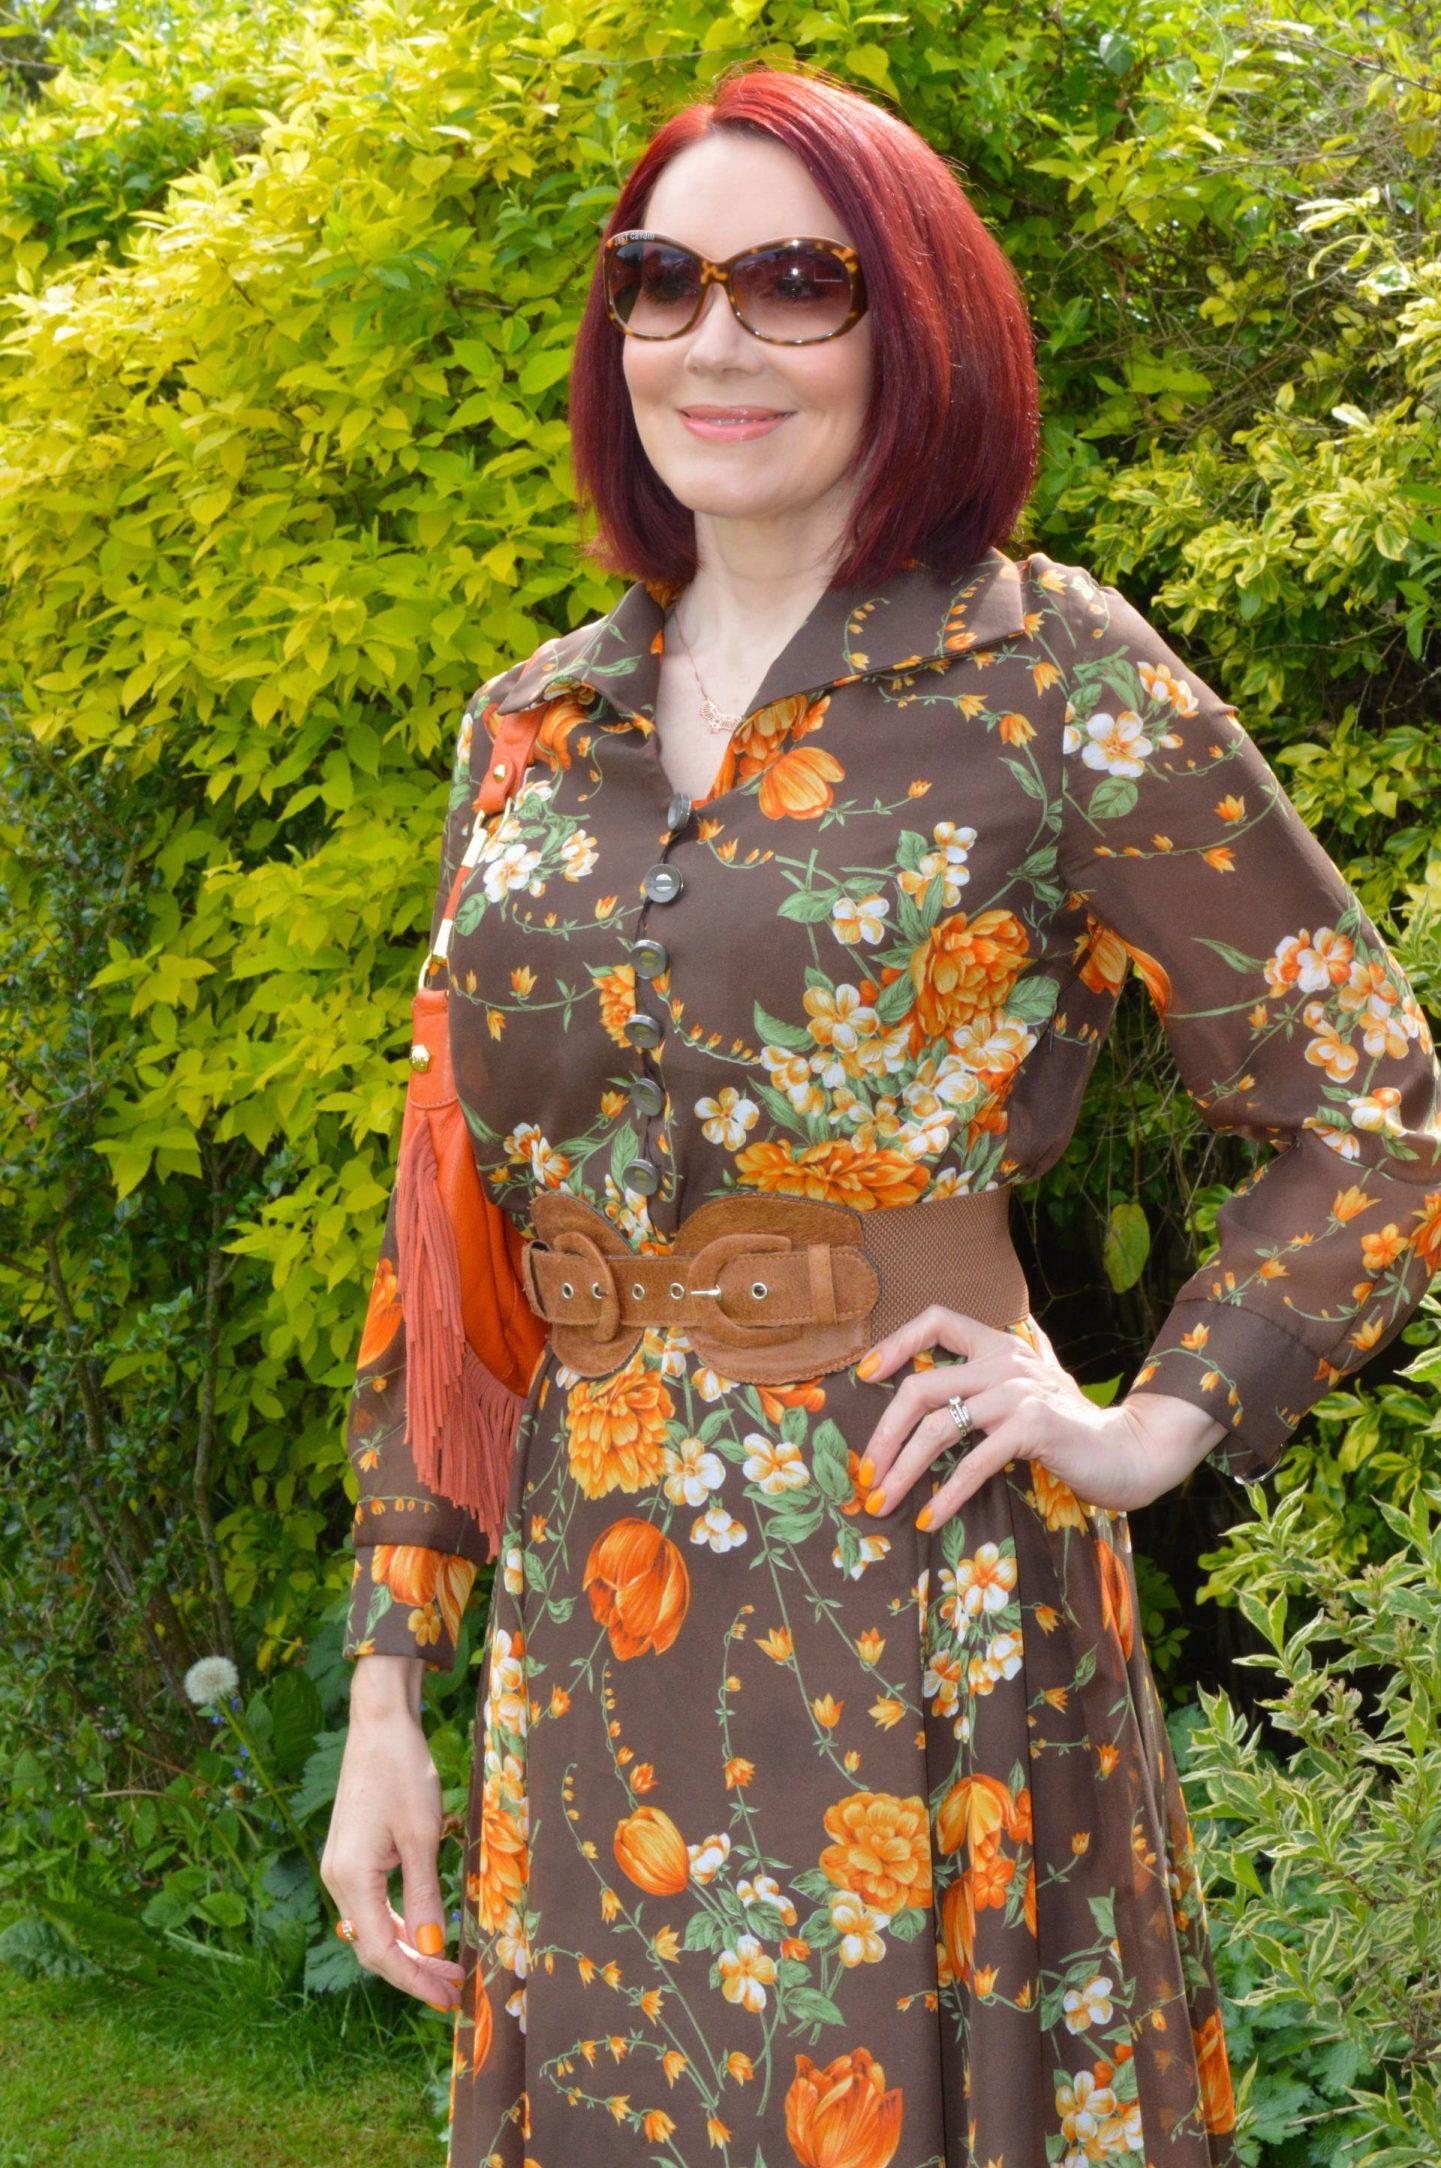 Wearing Pre-loved Floral Prints - May's Thrifty Six, vintage brown and orange floral print maxi dress, Modalu orange fringed bag